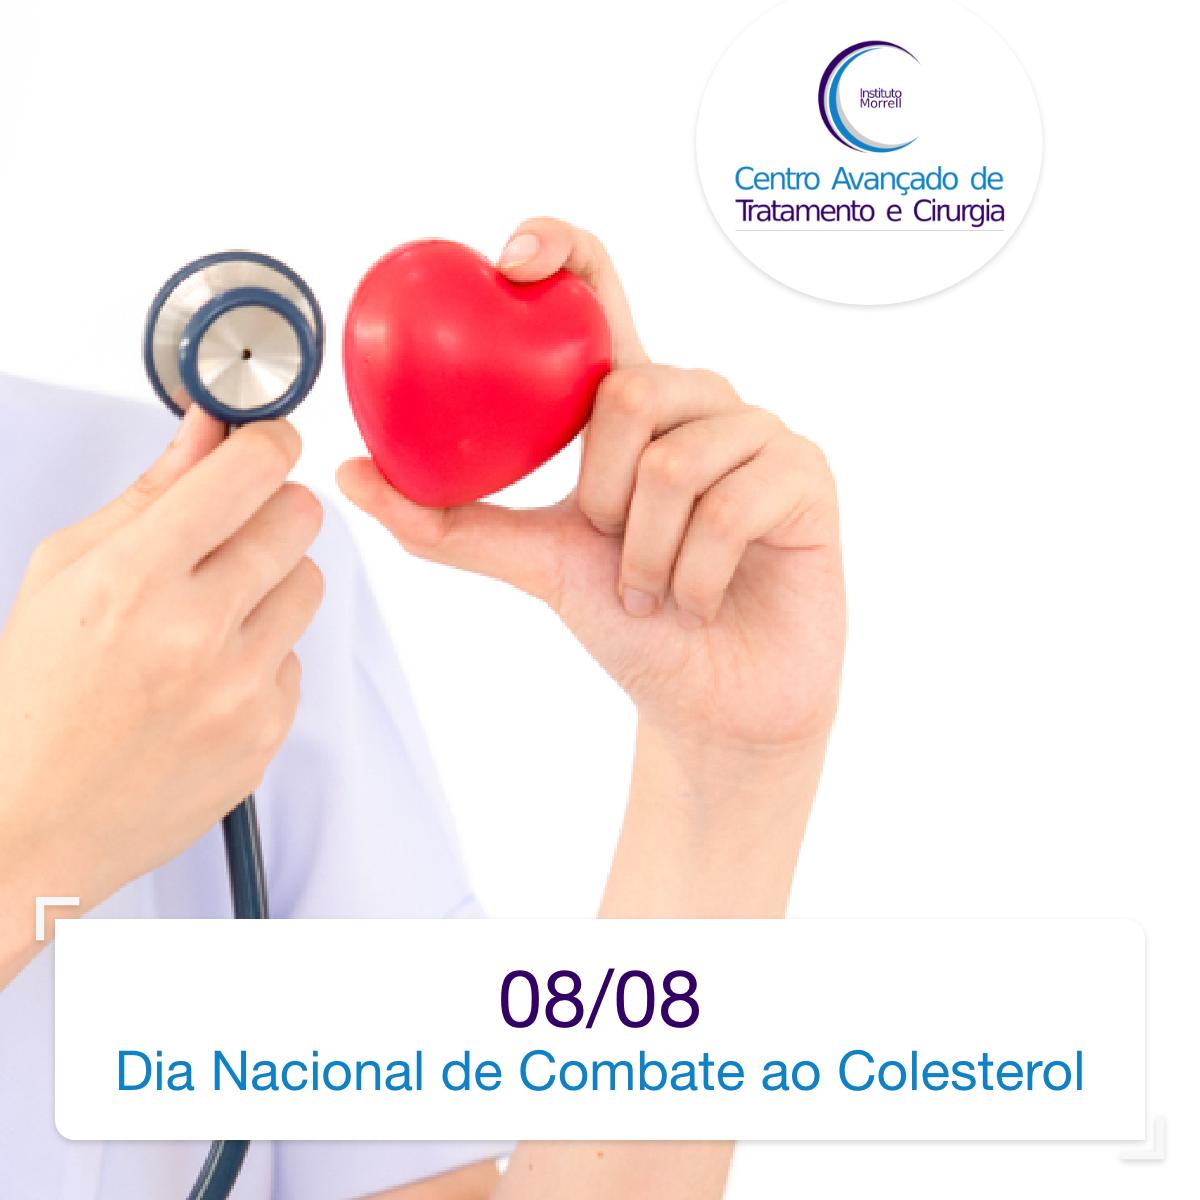 INSTITUTO_MORRELL-2018-08-08-Dia_Nacional_de_Combate_ao_Colesterol-1200x1200.png